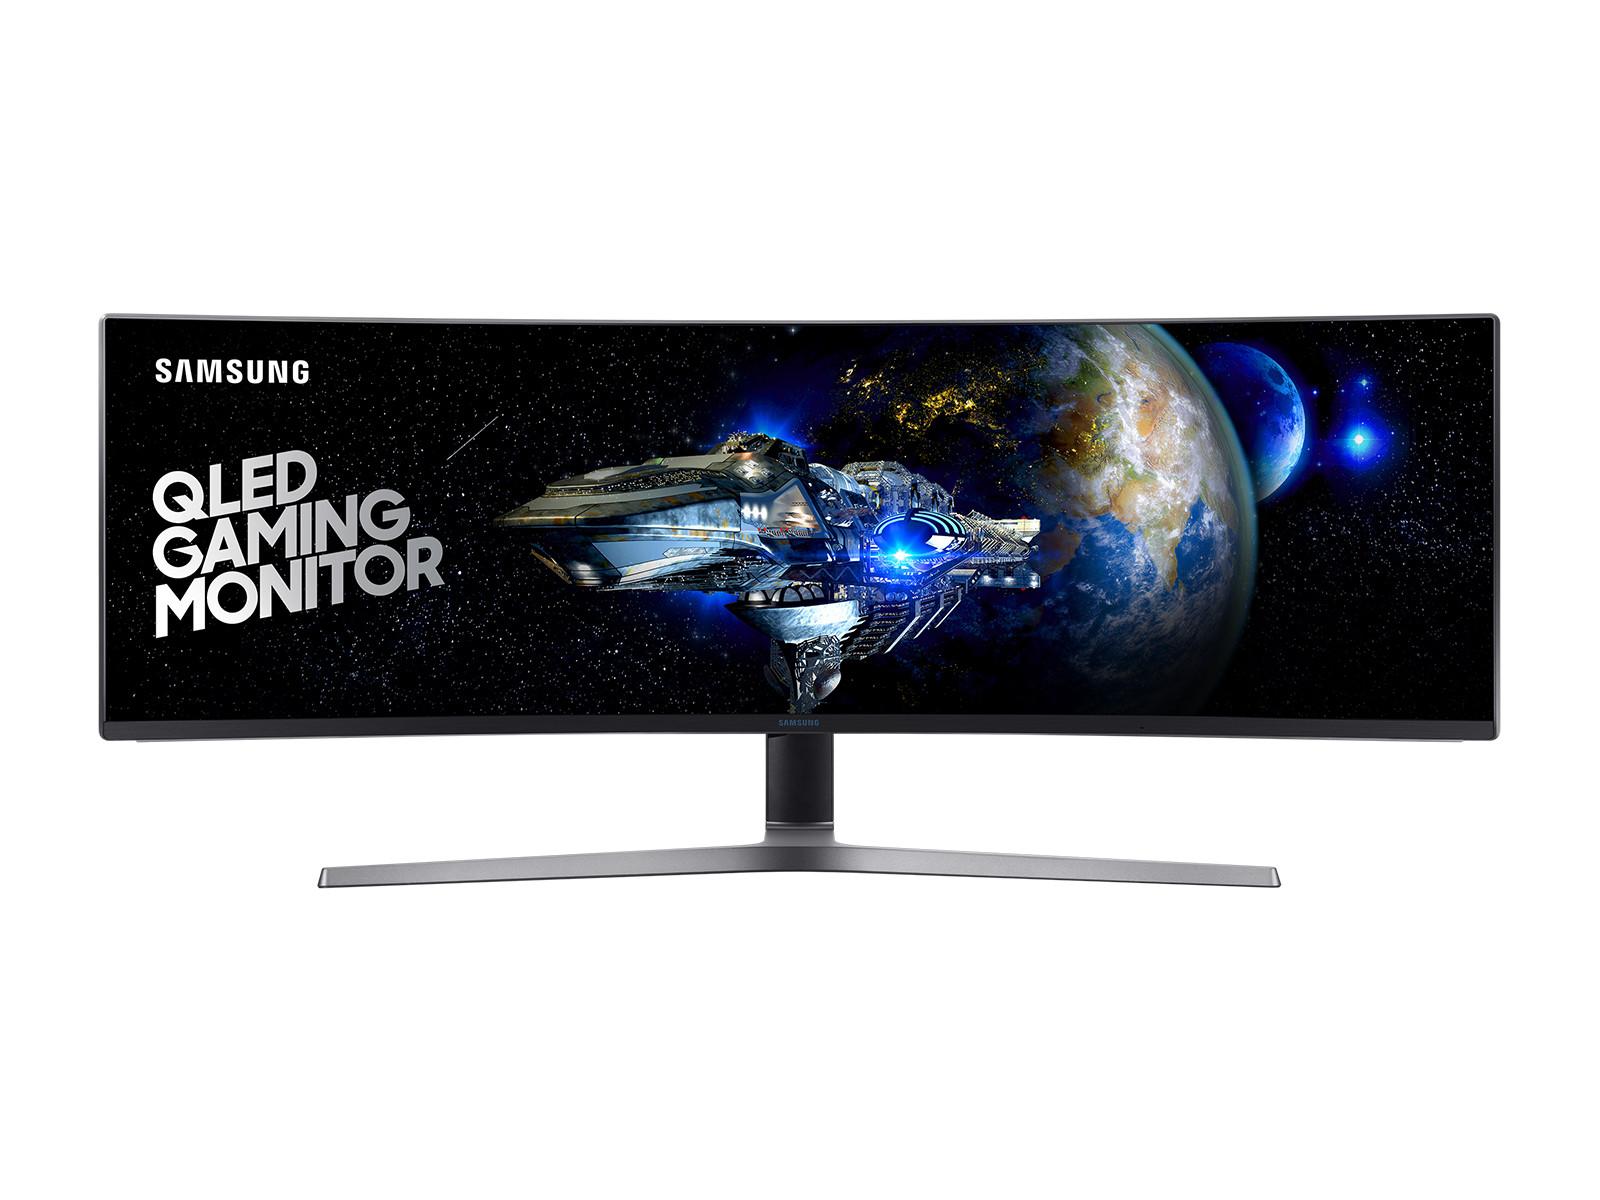 Samsung Ultra Wide Gaming Monitor Amazon UK Quantum Dot